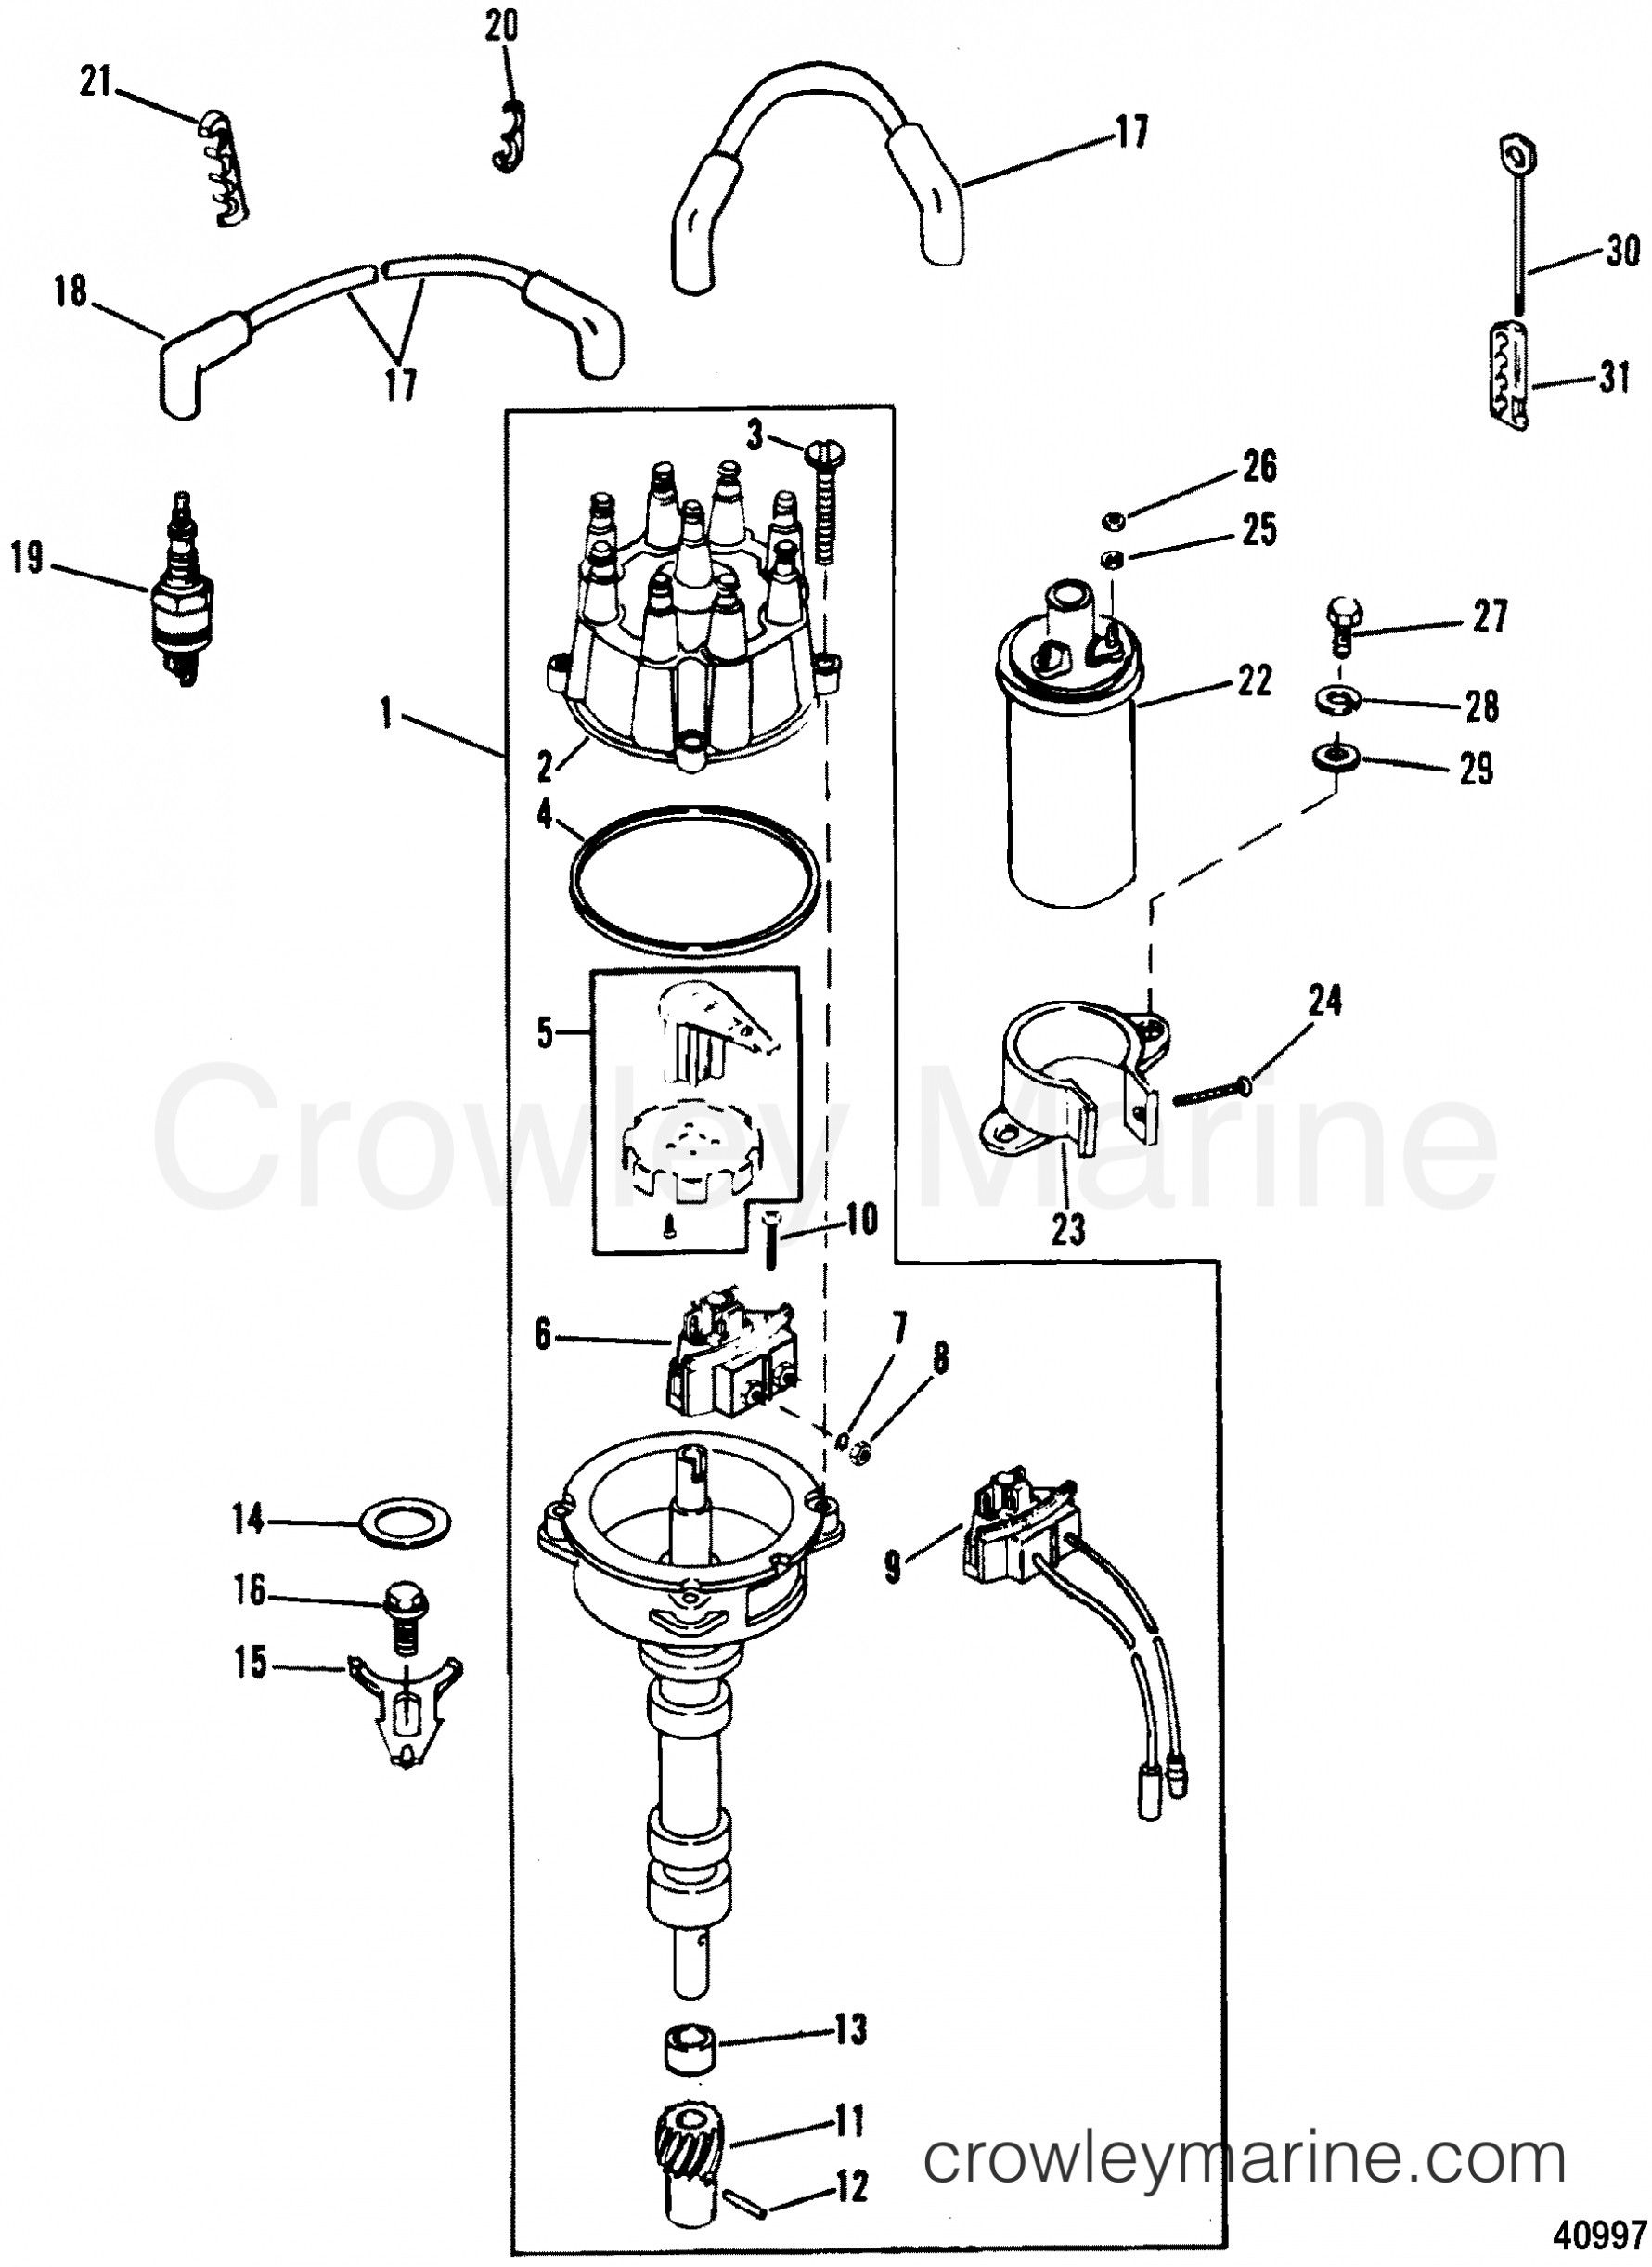 hiniker plow light diagrams service manual library in hiniker plow wiring diagram [ 1780 x 2442 Pixel ]